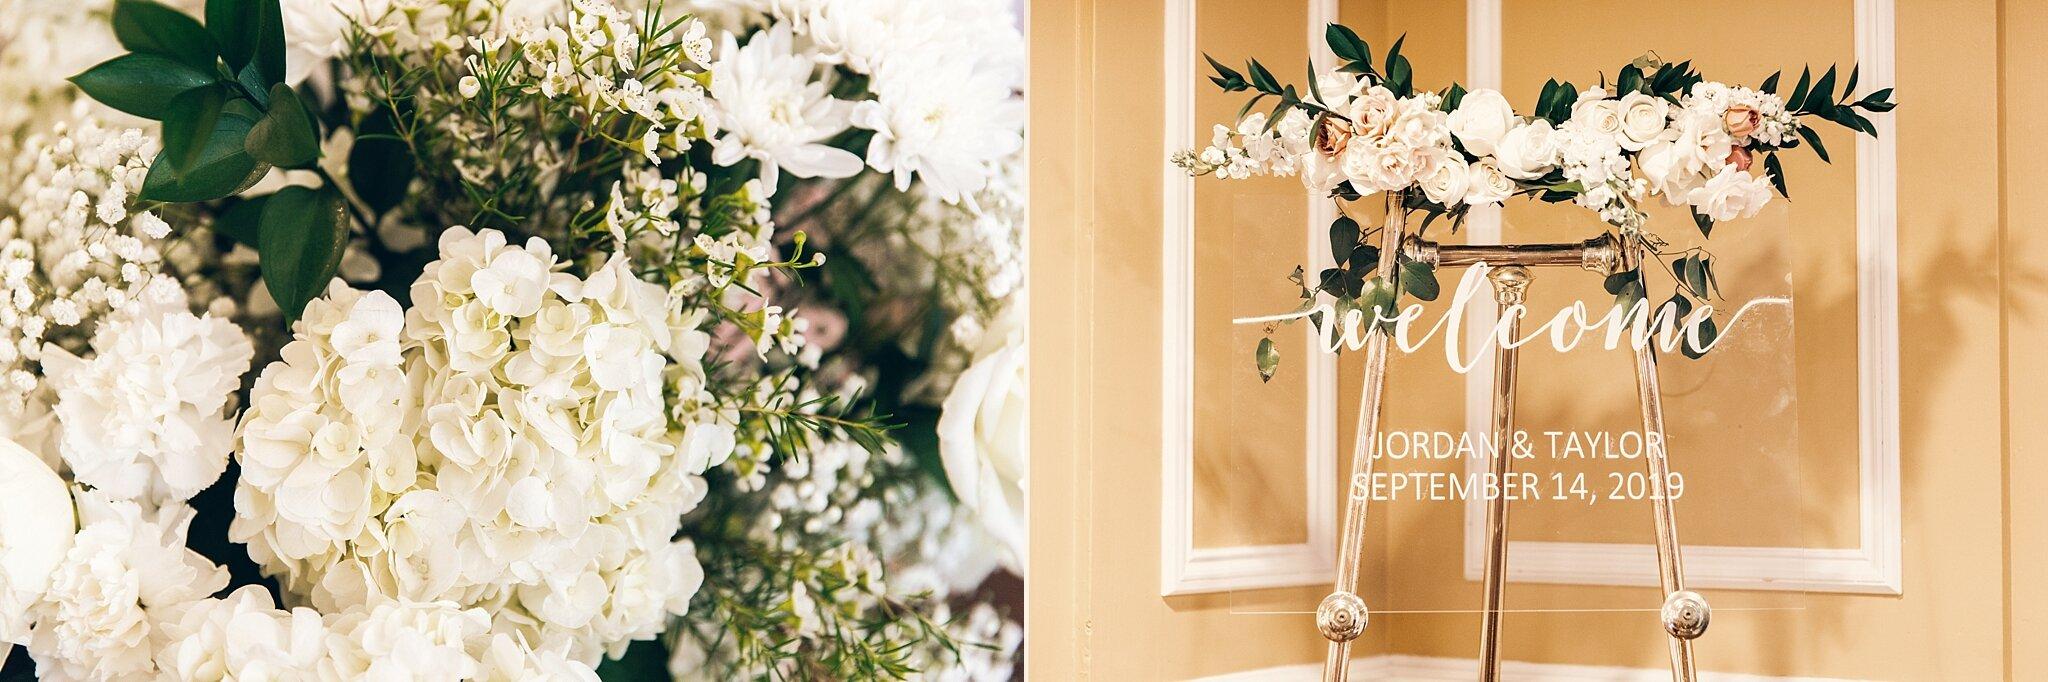 patrick-henry-ballroom-wedding-roanoke_0523.jpg